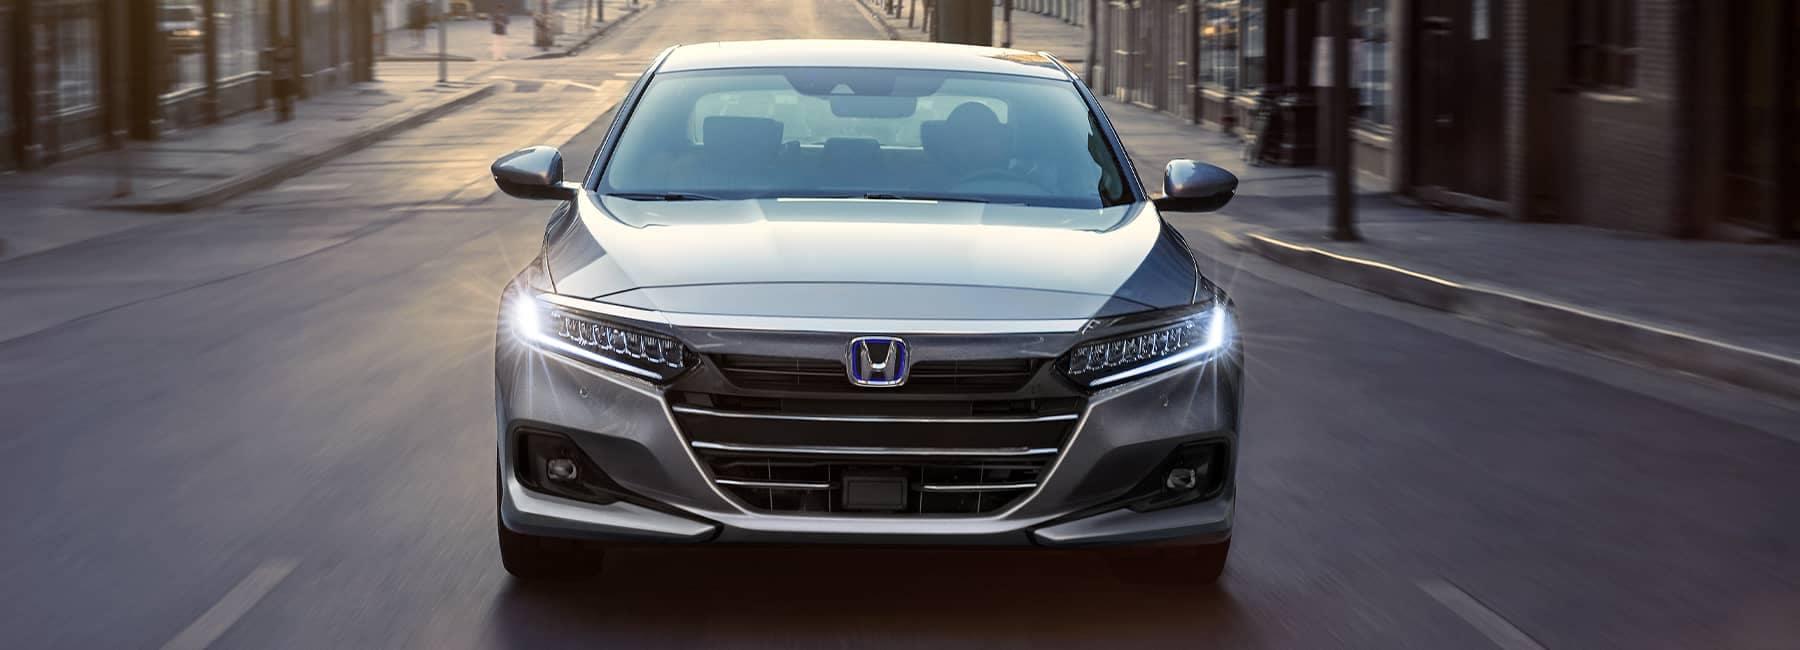 Auto Financing in Peoria | Arrowhead Honda